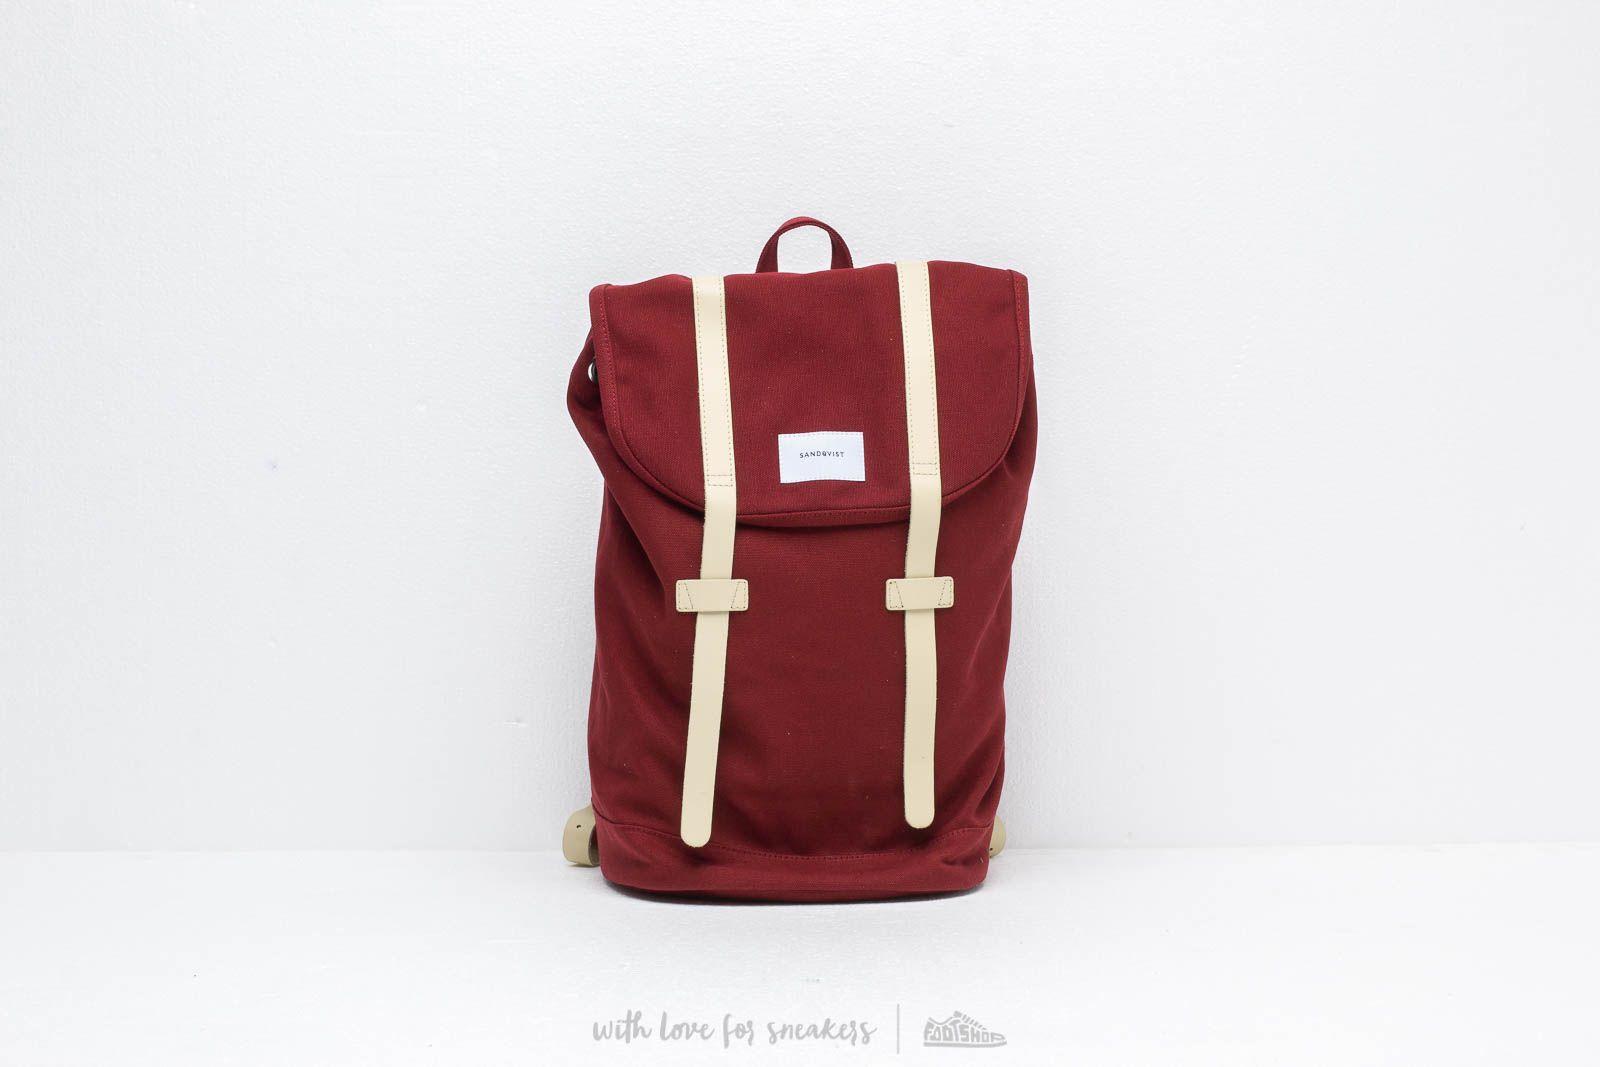 SANDQVIST Stig Backpack Burgundy Natural za skvelú cenu 125 € kúpite na Footshop.sk